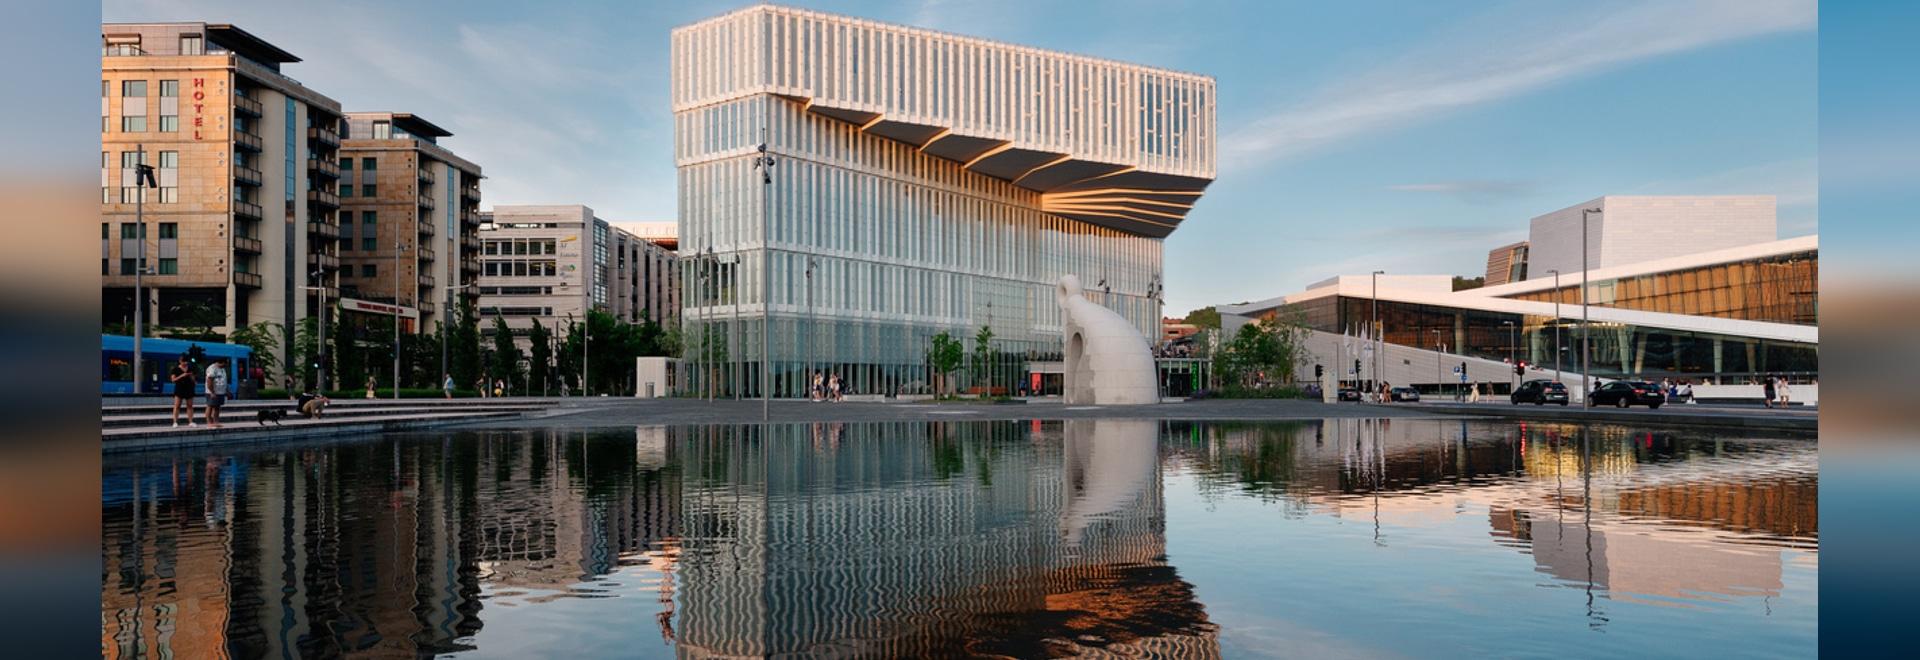 Biblioteca Deichman / Atelier Oslo + Lund Hagem